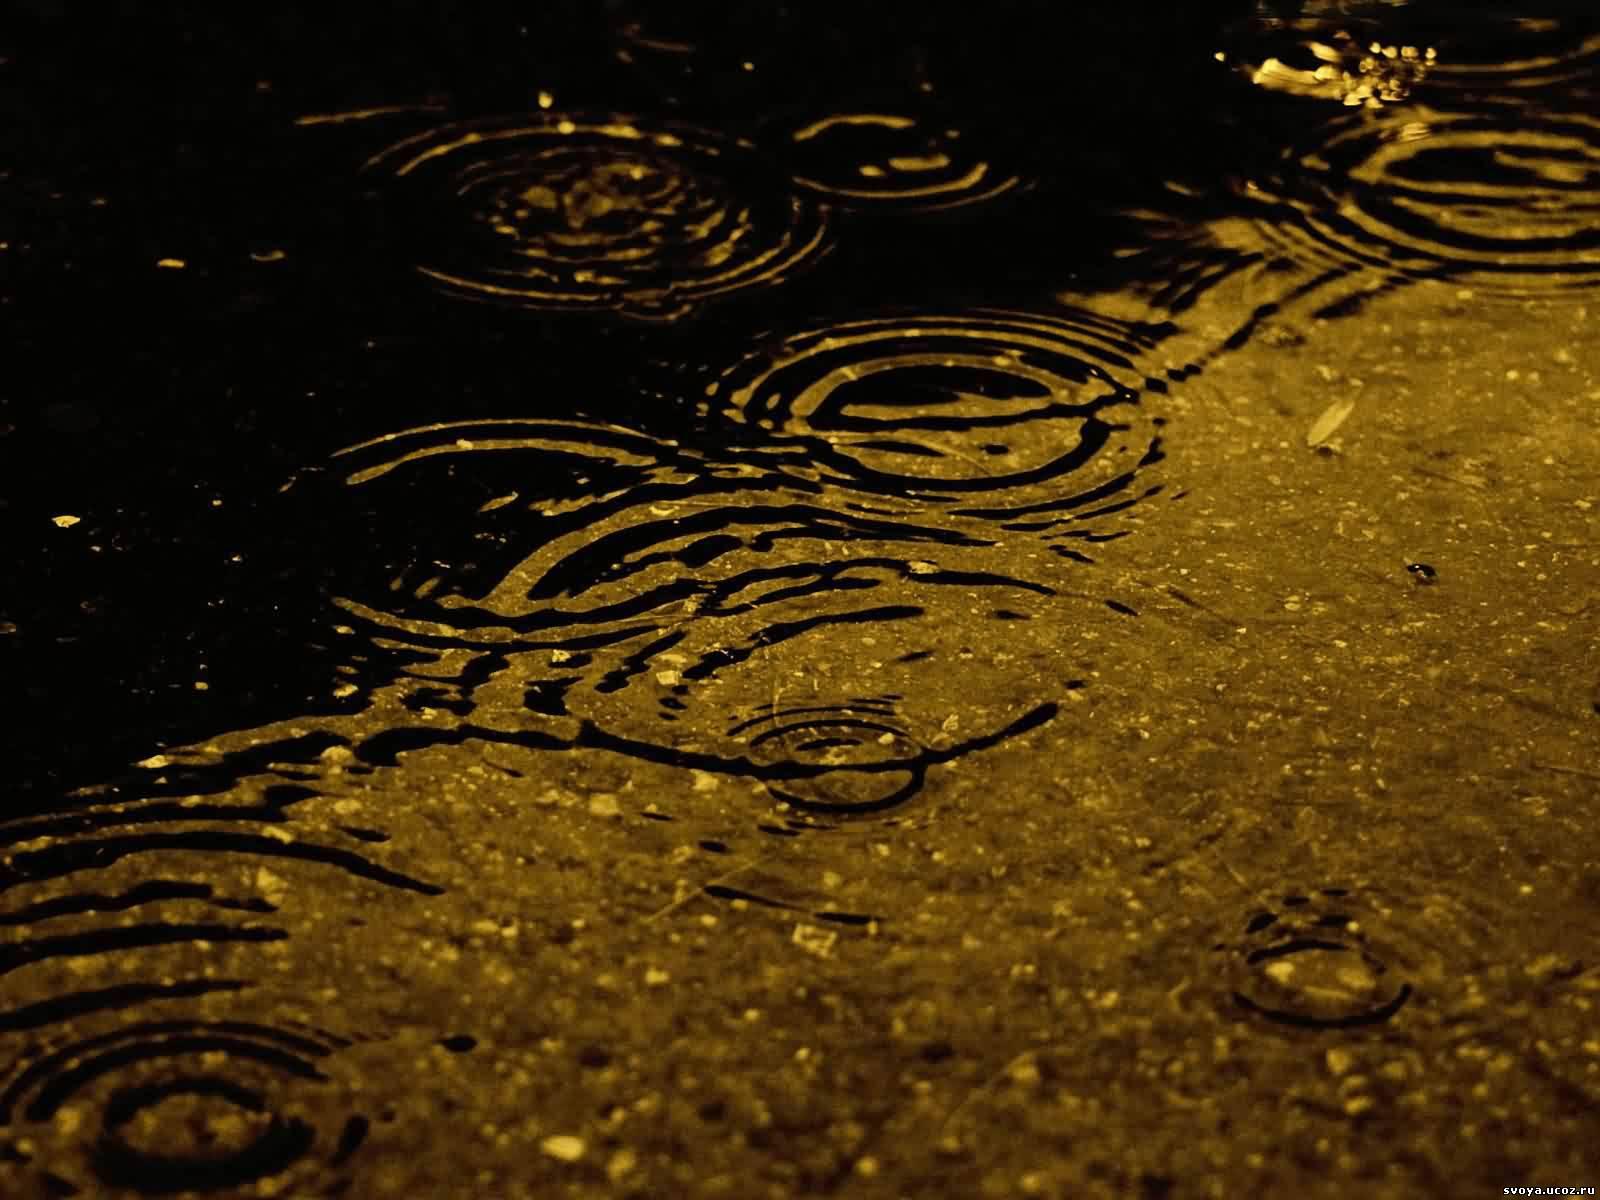 3d Animated Gif Wallpaper For Mobile Осенний дождь Обои для рабочего стола 1600х1200